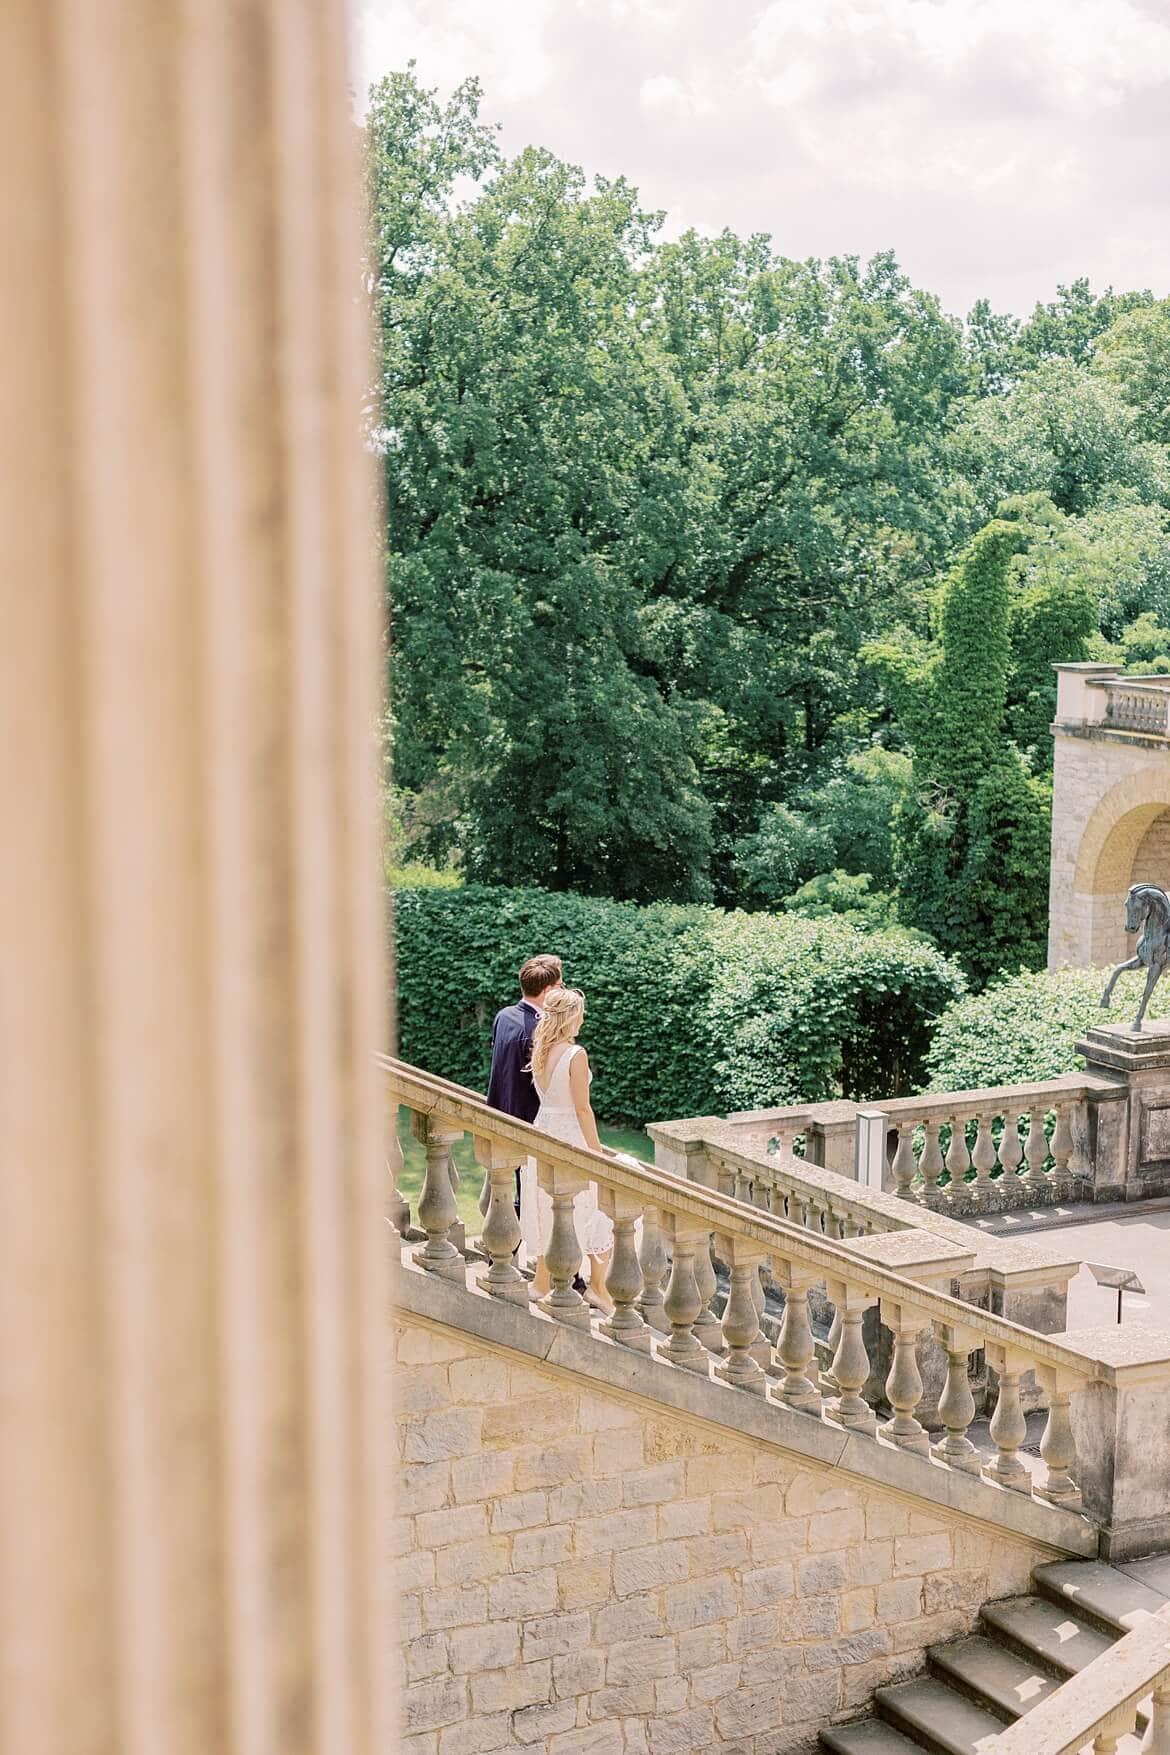 Brautpaar läuft Freitreppe hinunter